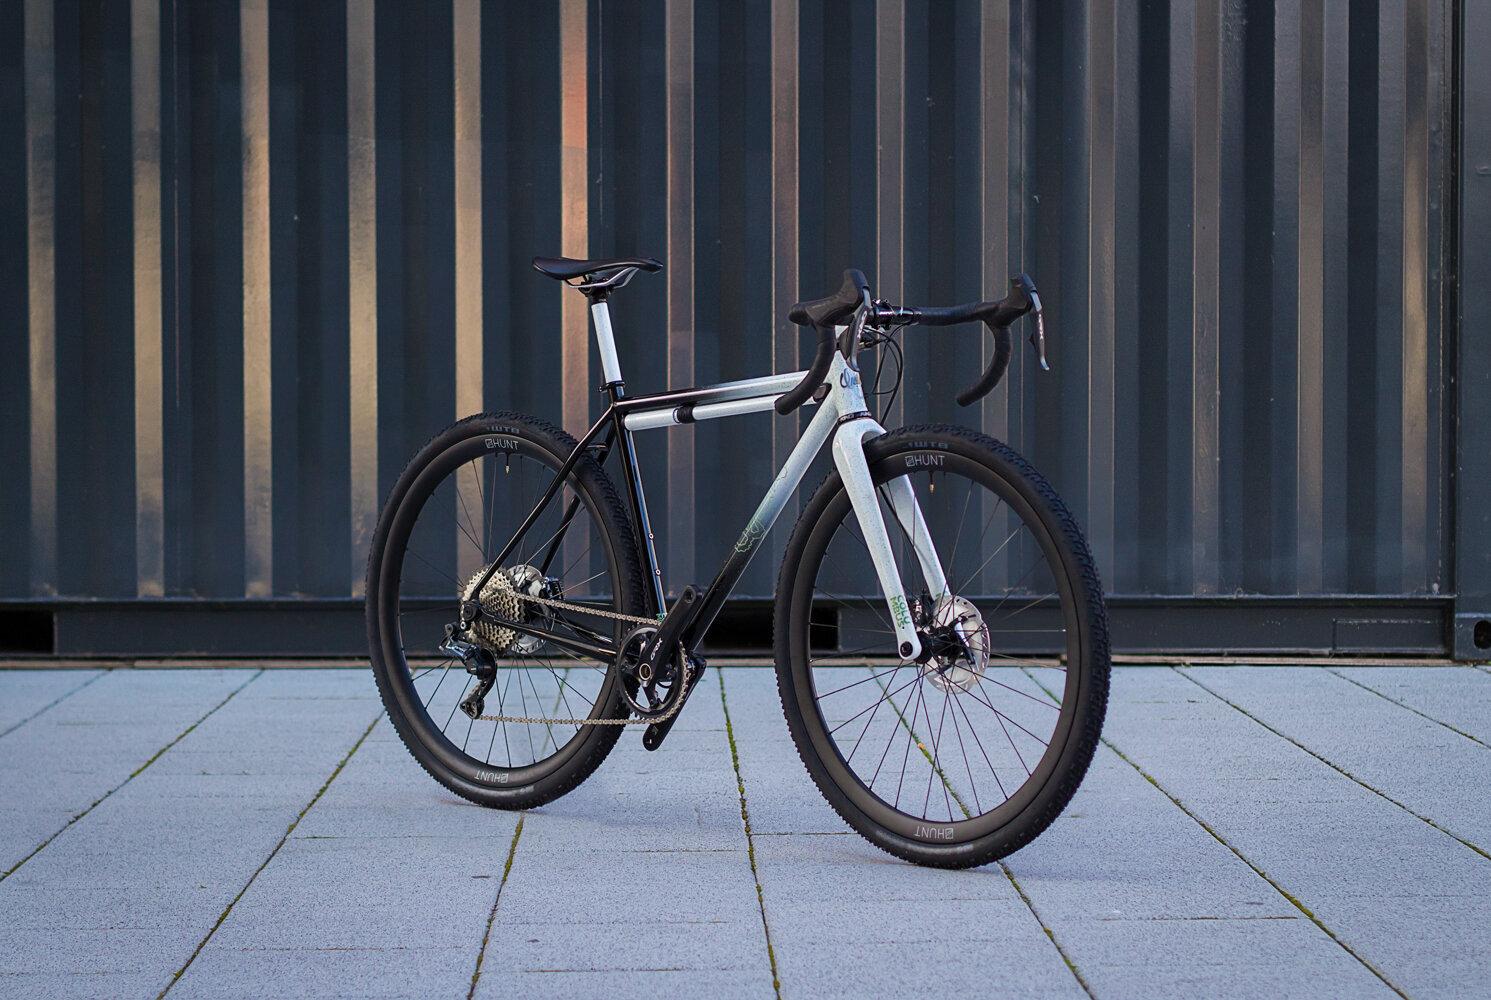 quirk_cycles_oli_kegety_11.jpg